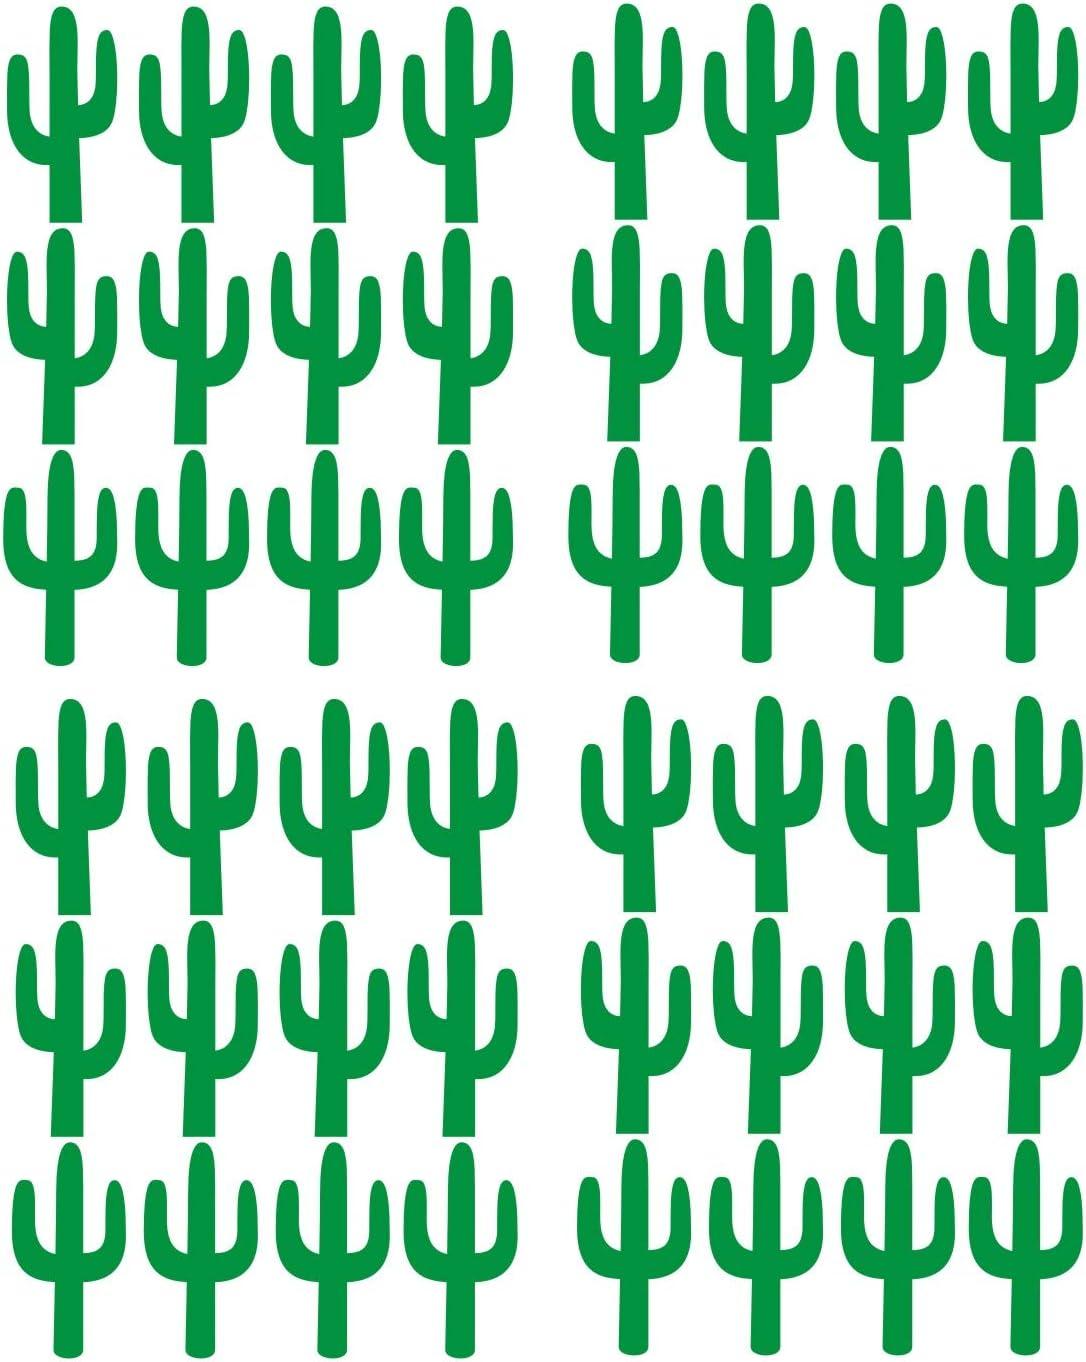 JOYRESIDE 48 Pieces/Set Cactus Decals Wall Vinyl Sticker Home House Nursery Desin Cacti for Baby Kids Boy Girl Bedroom Living Room Decoration Art Decor YMX20 (Green)